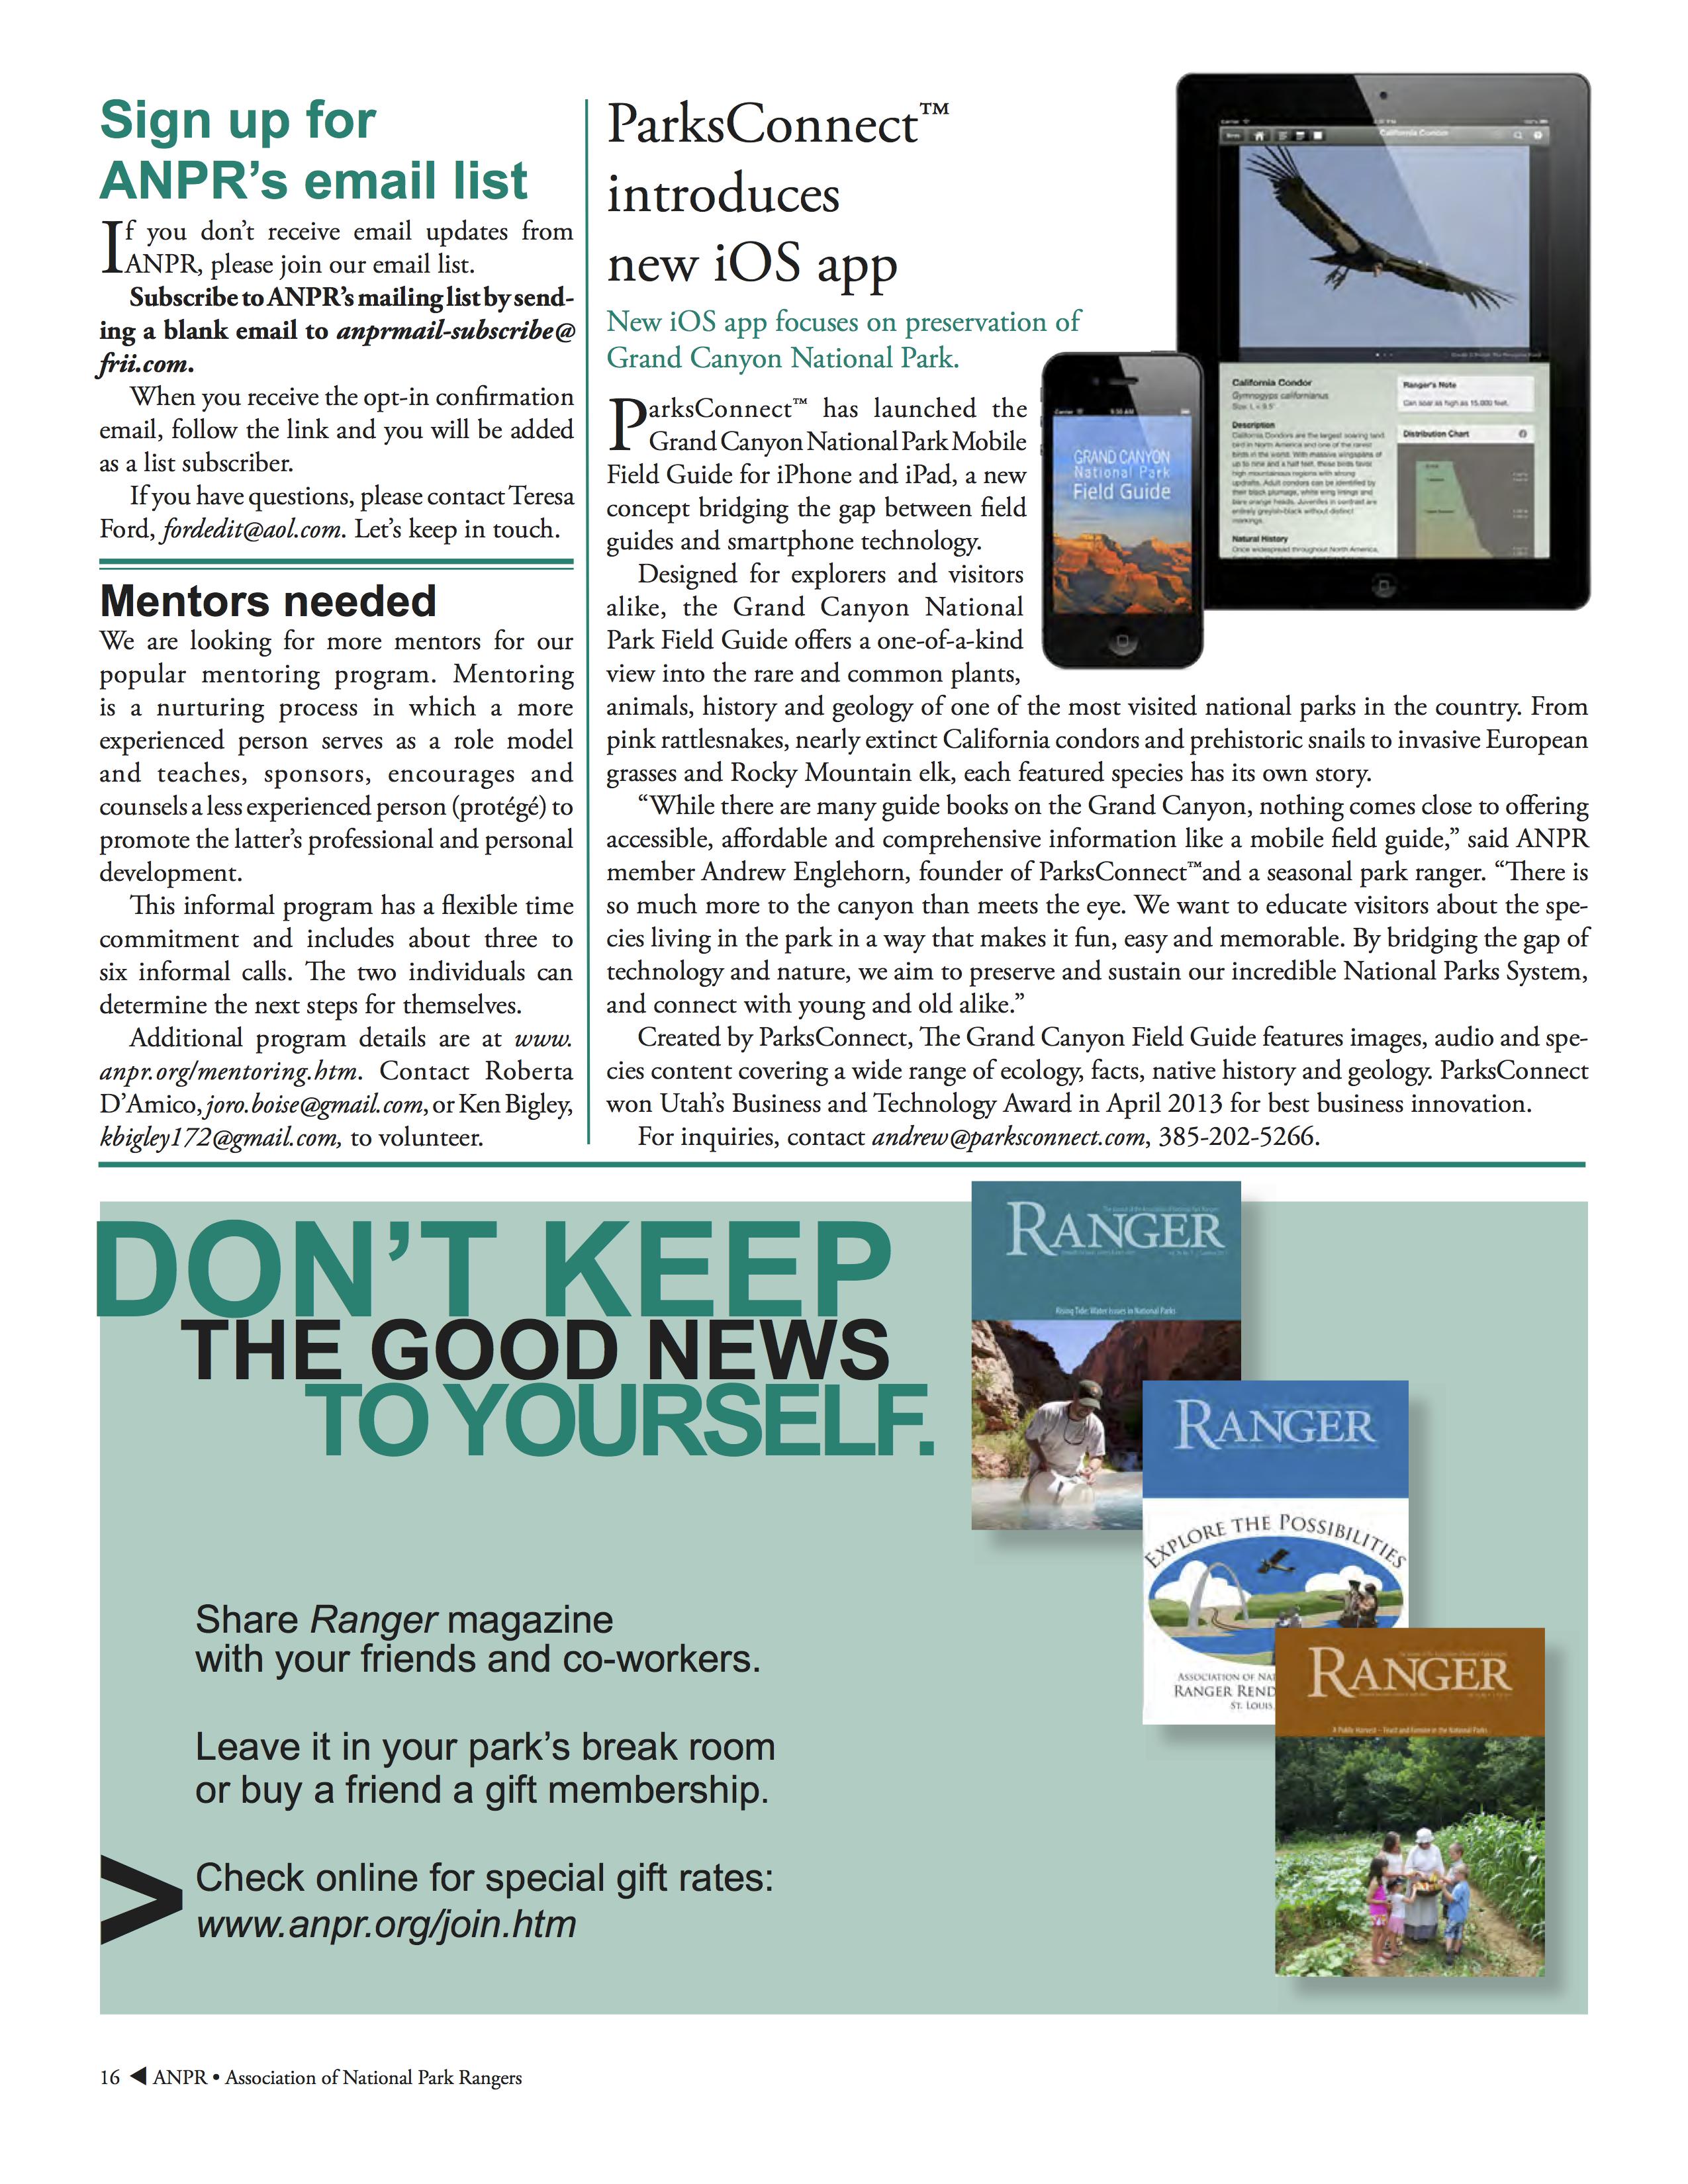 Ranger Magazine Article